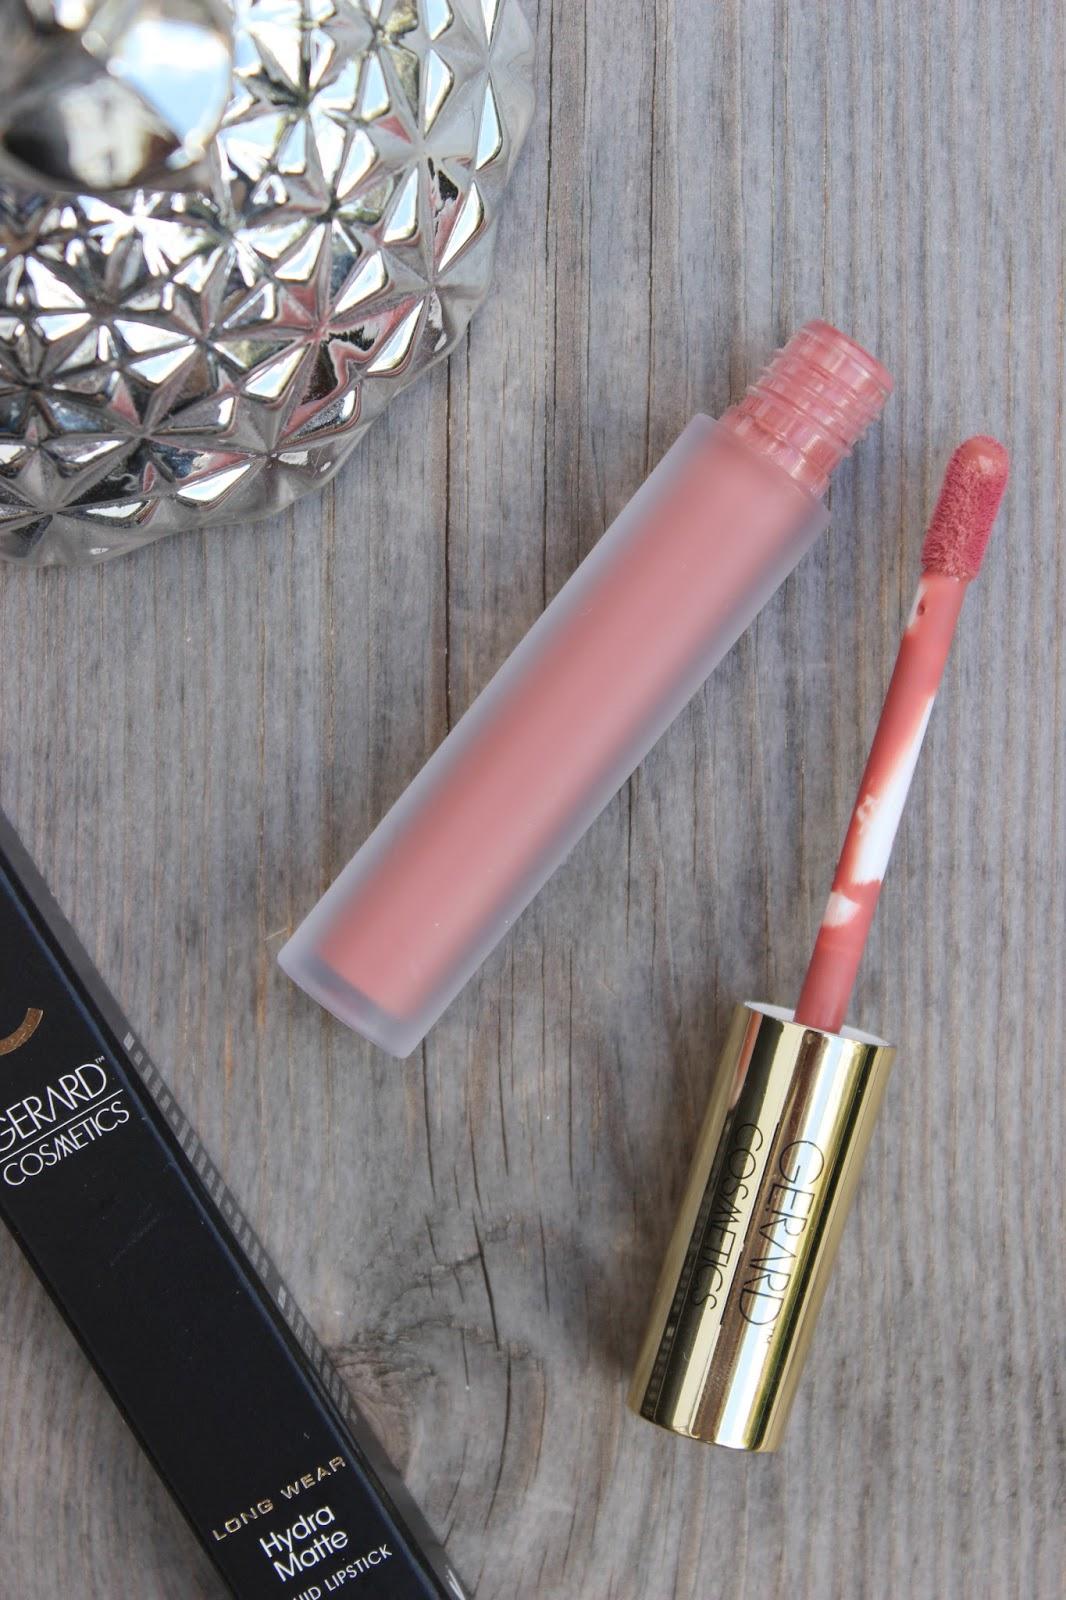 Gerard Cosmetics Hydra Matte Liquid Lipstick in 'Serenity'